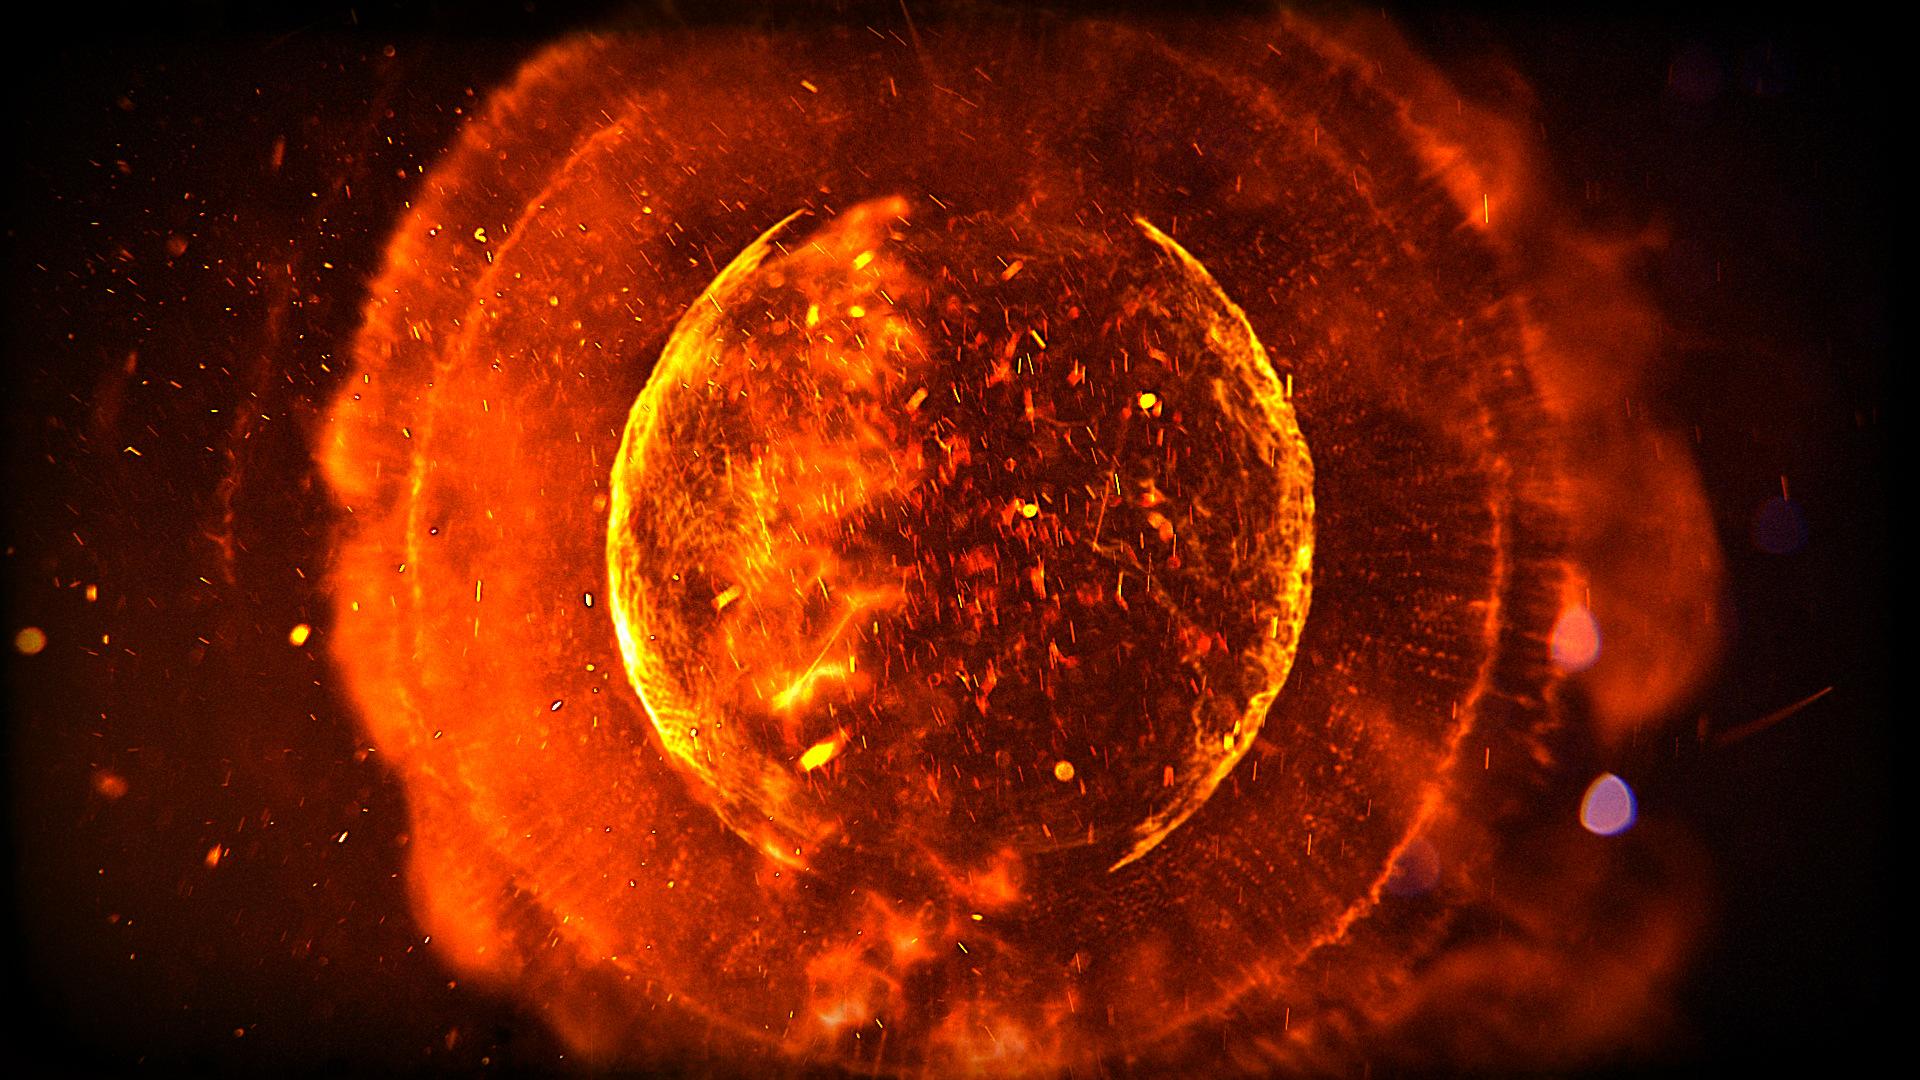 Fire_Sparks_L06_v01